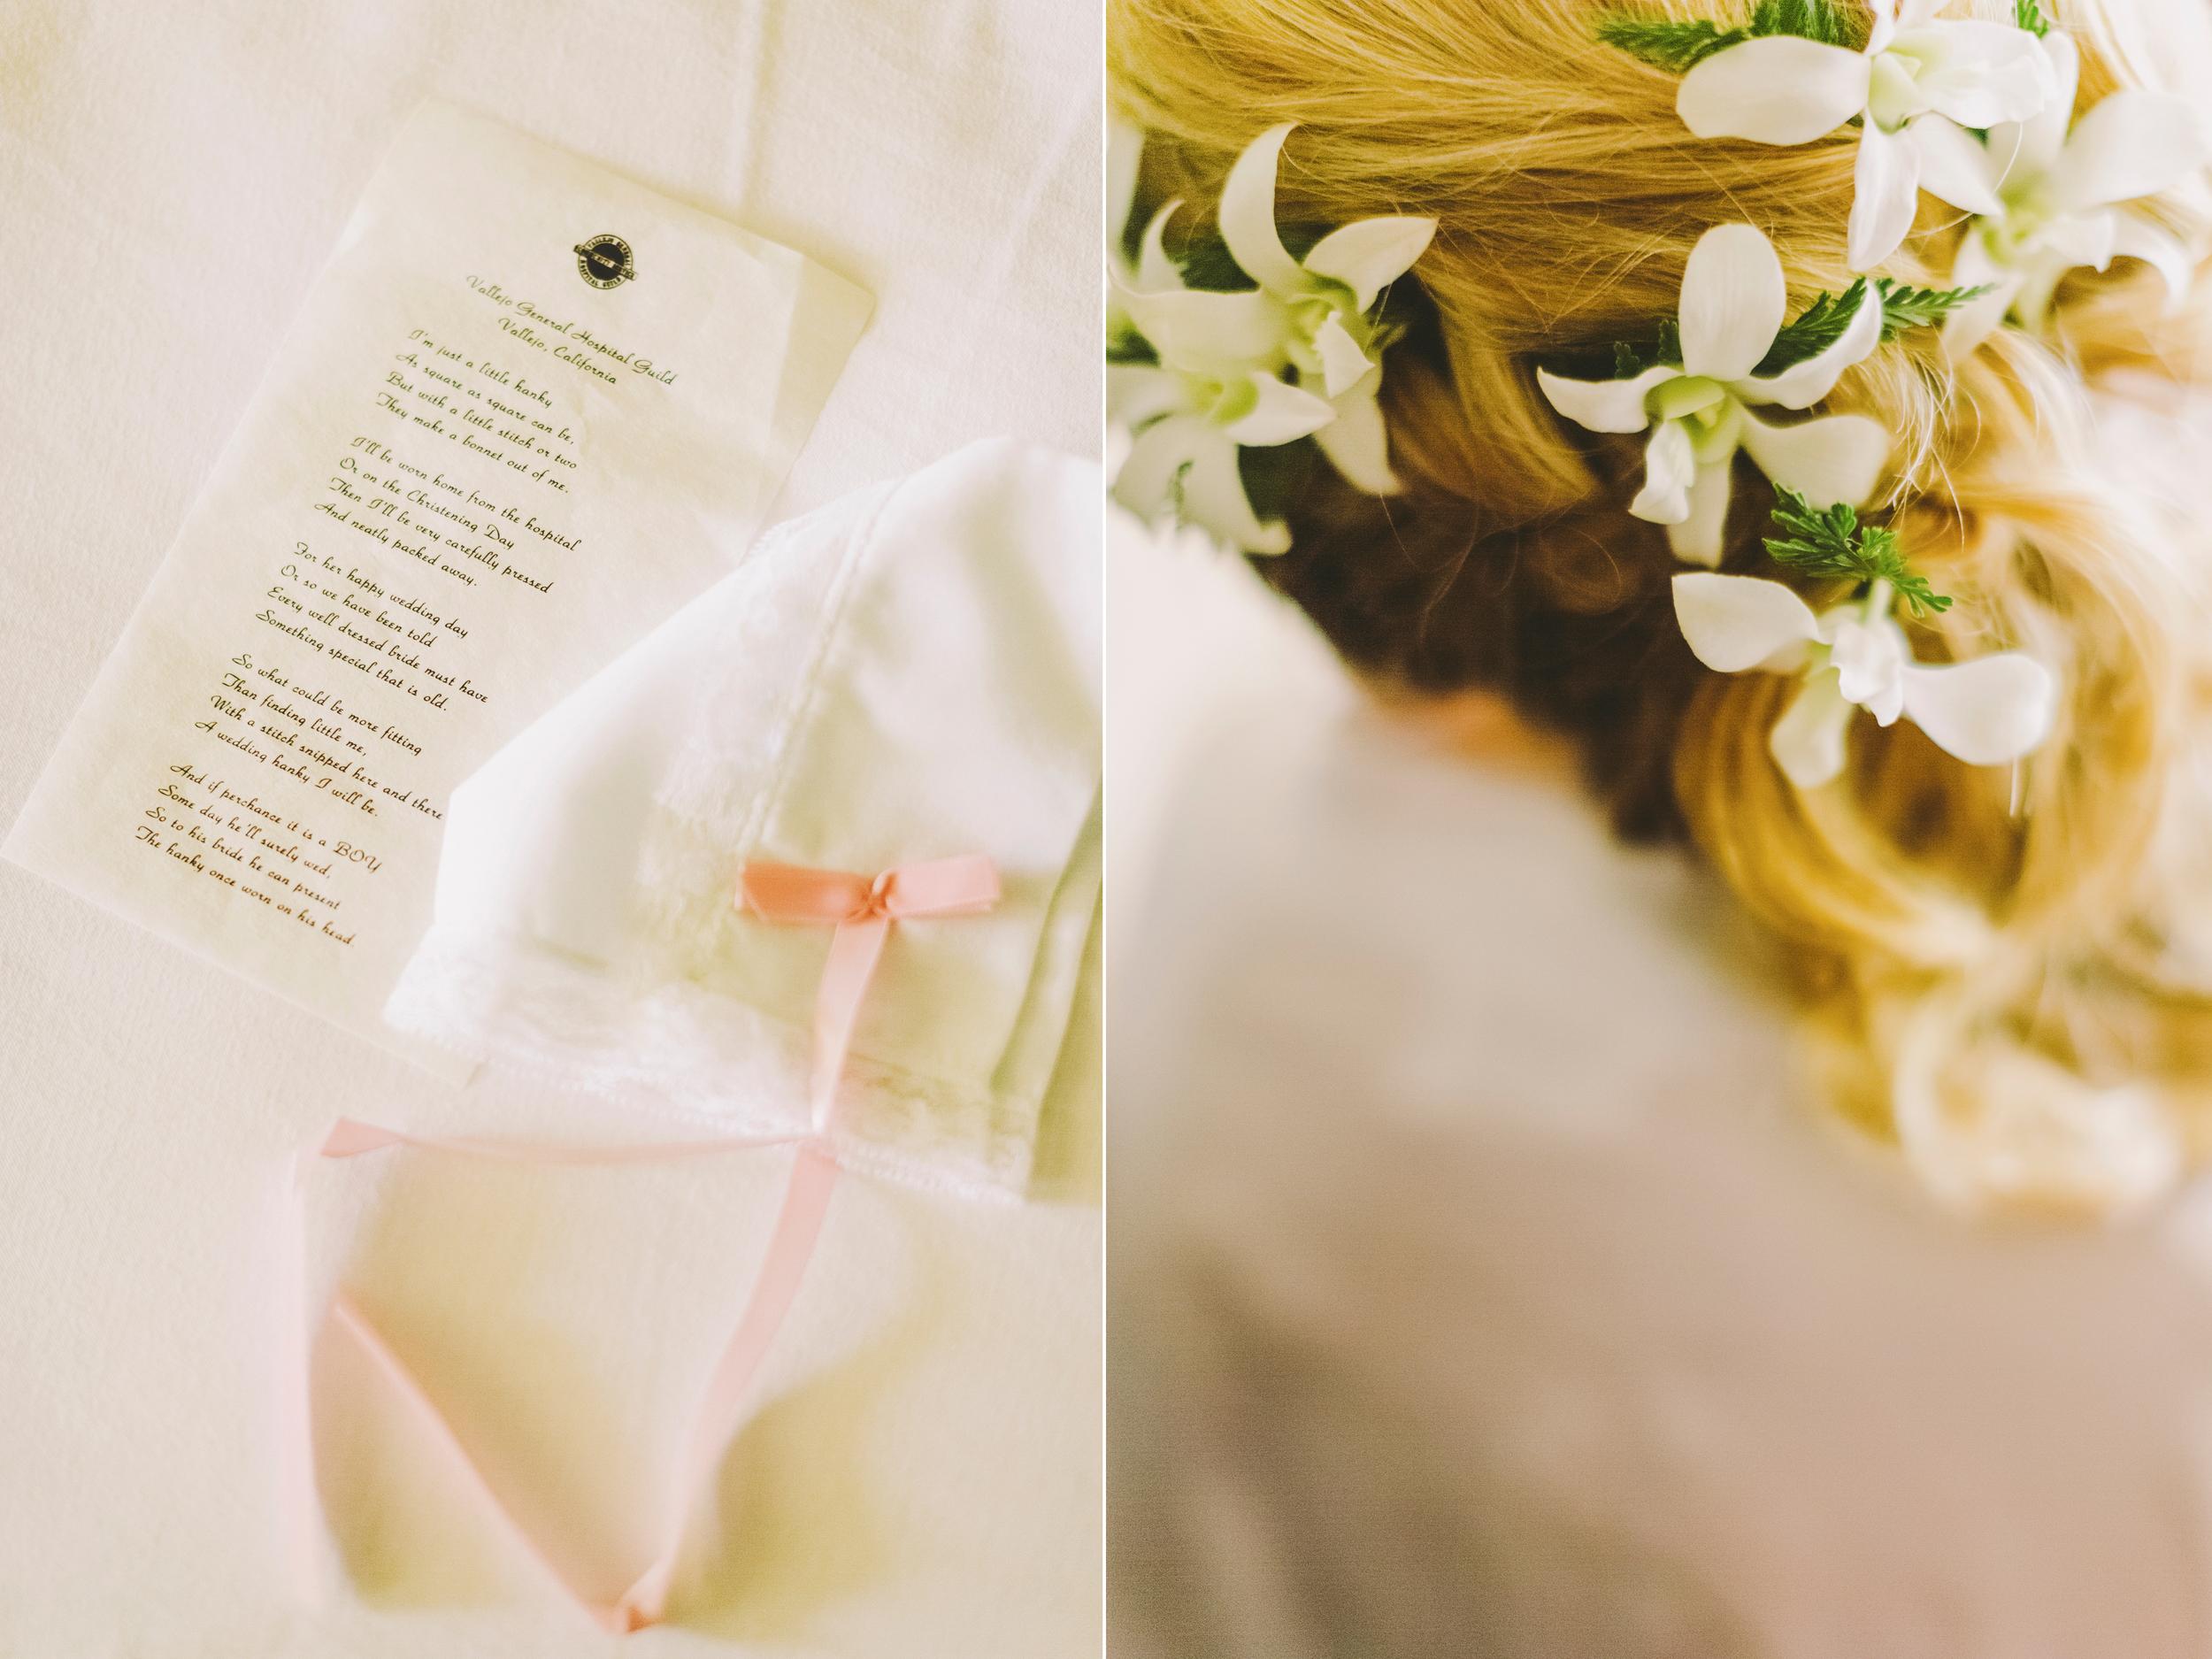 angie-diaz-photography-hawaii-wedding-photographer-kelli-jay-10.jpg